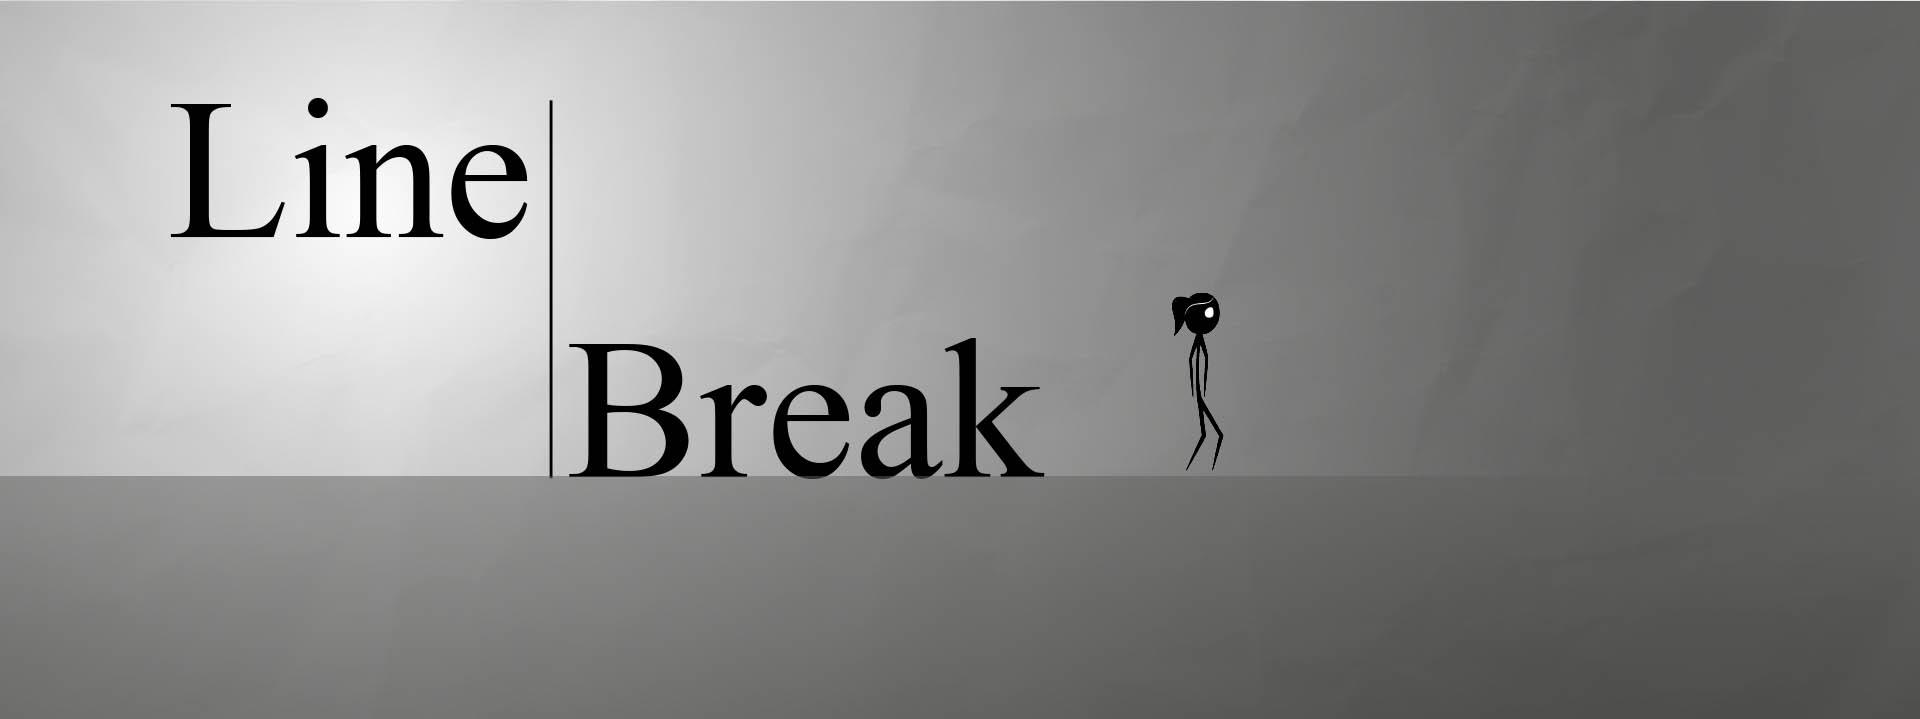 Line Break